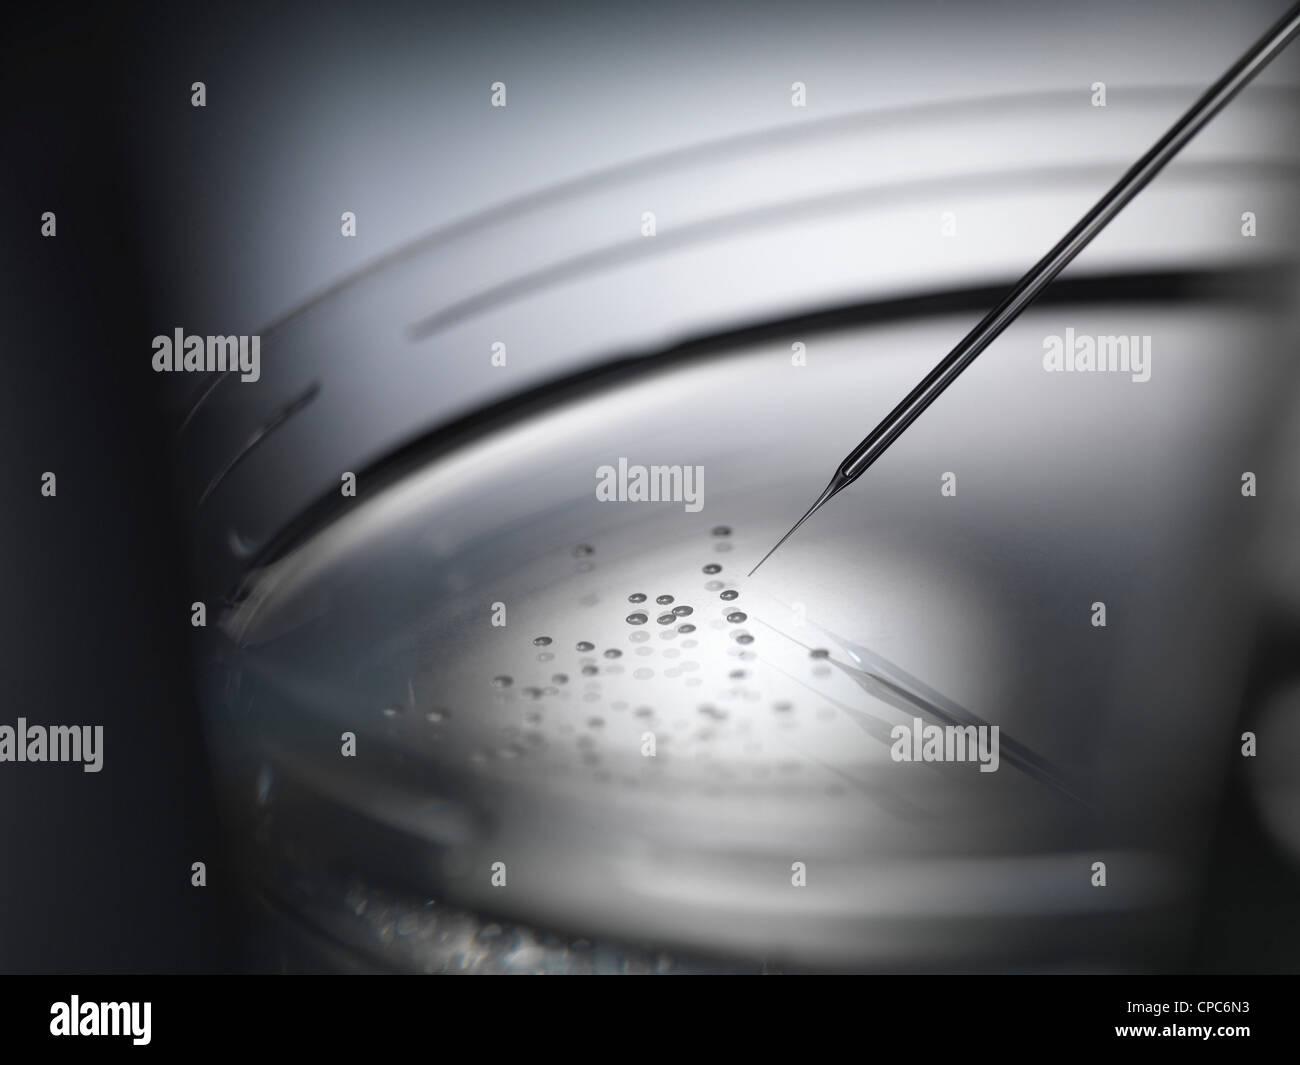 Micro pipette and cells in petri dish - Stock Image